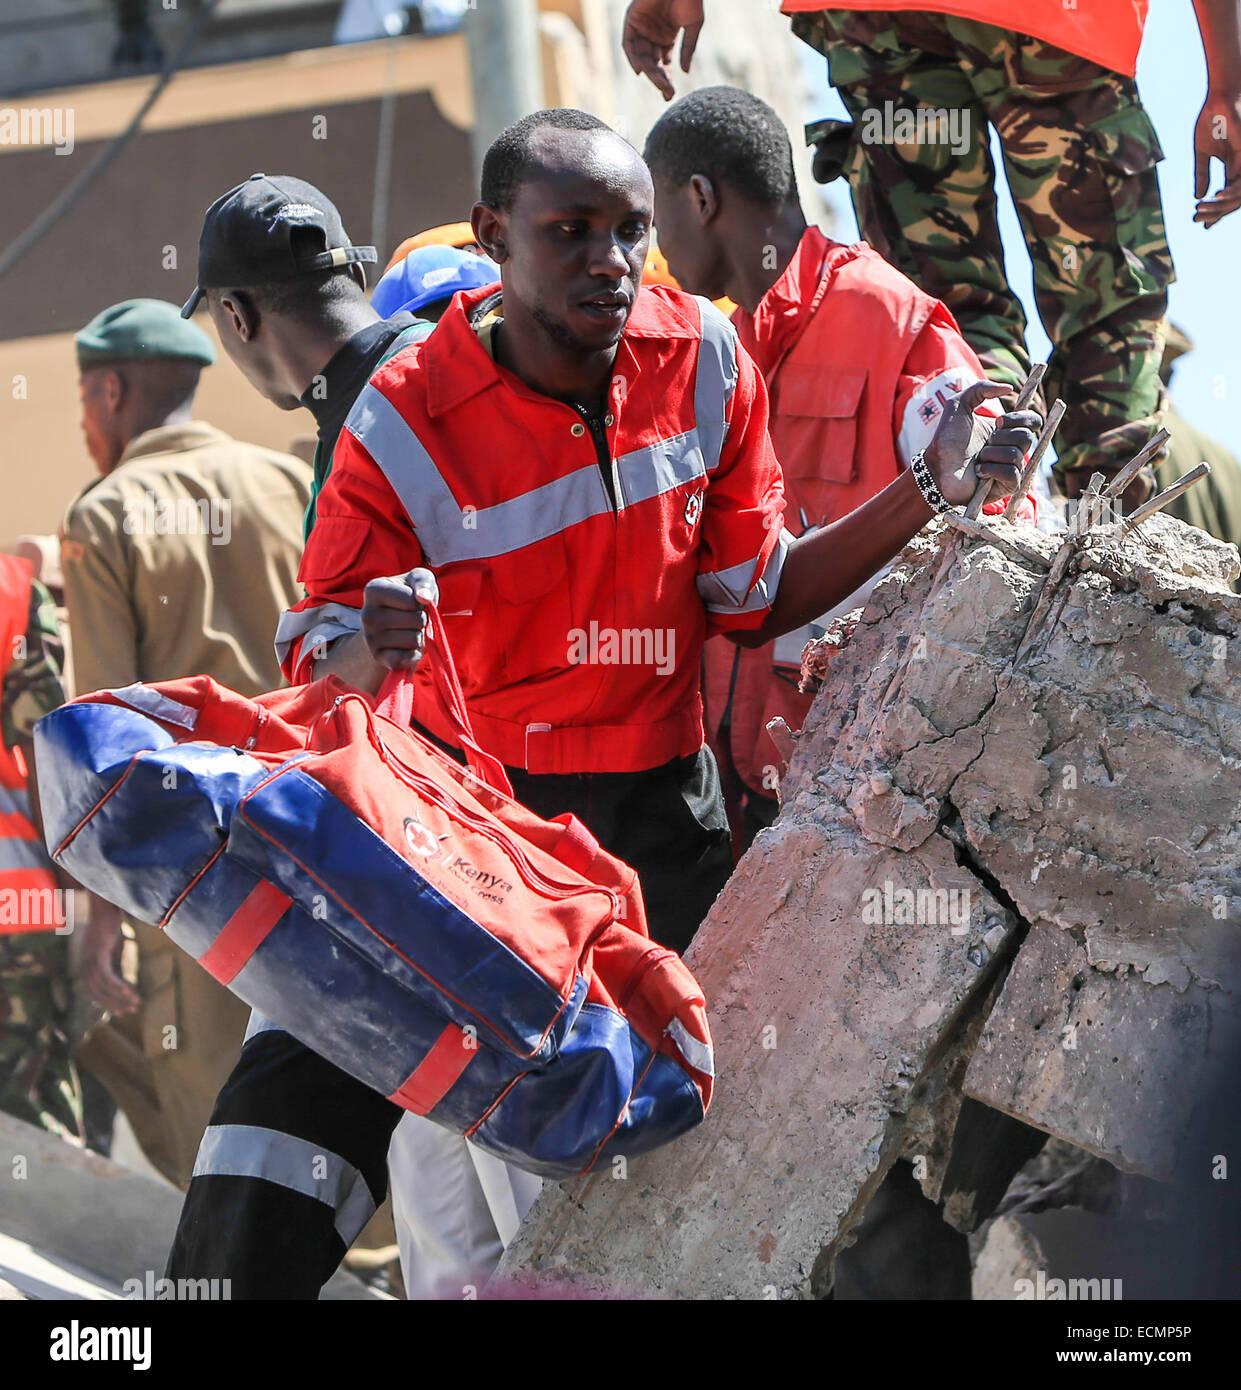 Nairobi, Kenya  17th Dec, 2014  A Kenya Red Cross worker